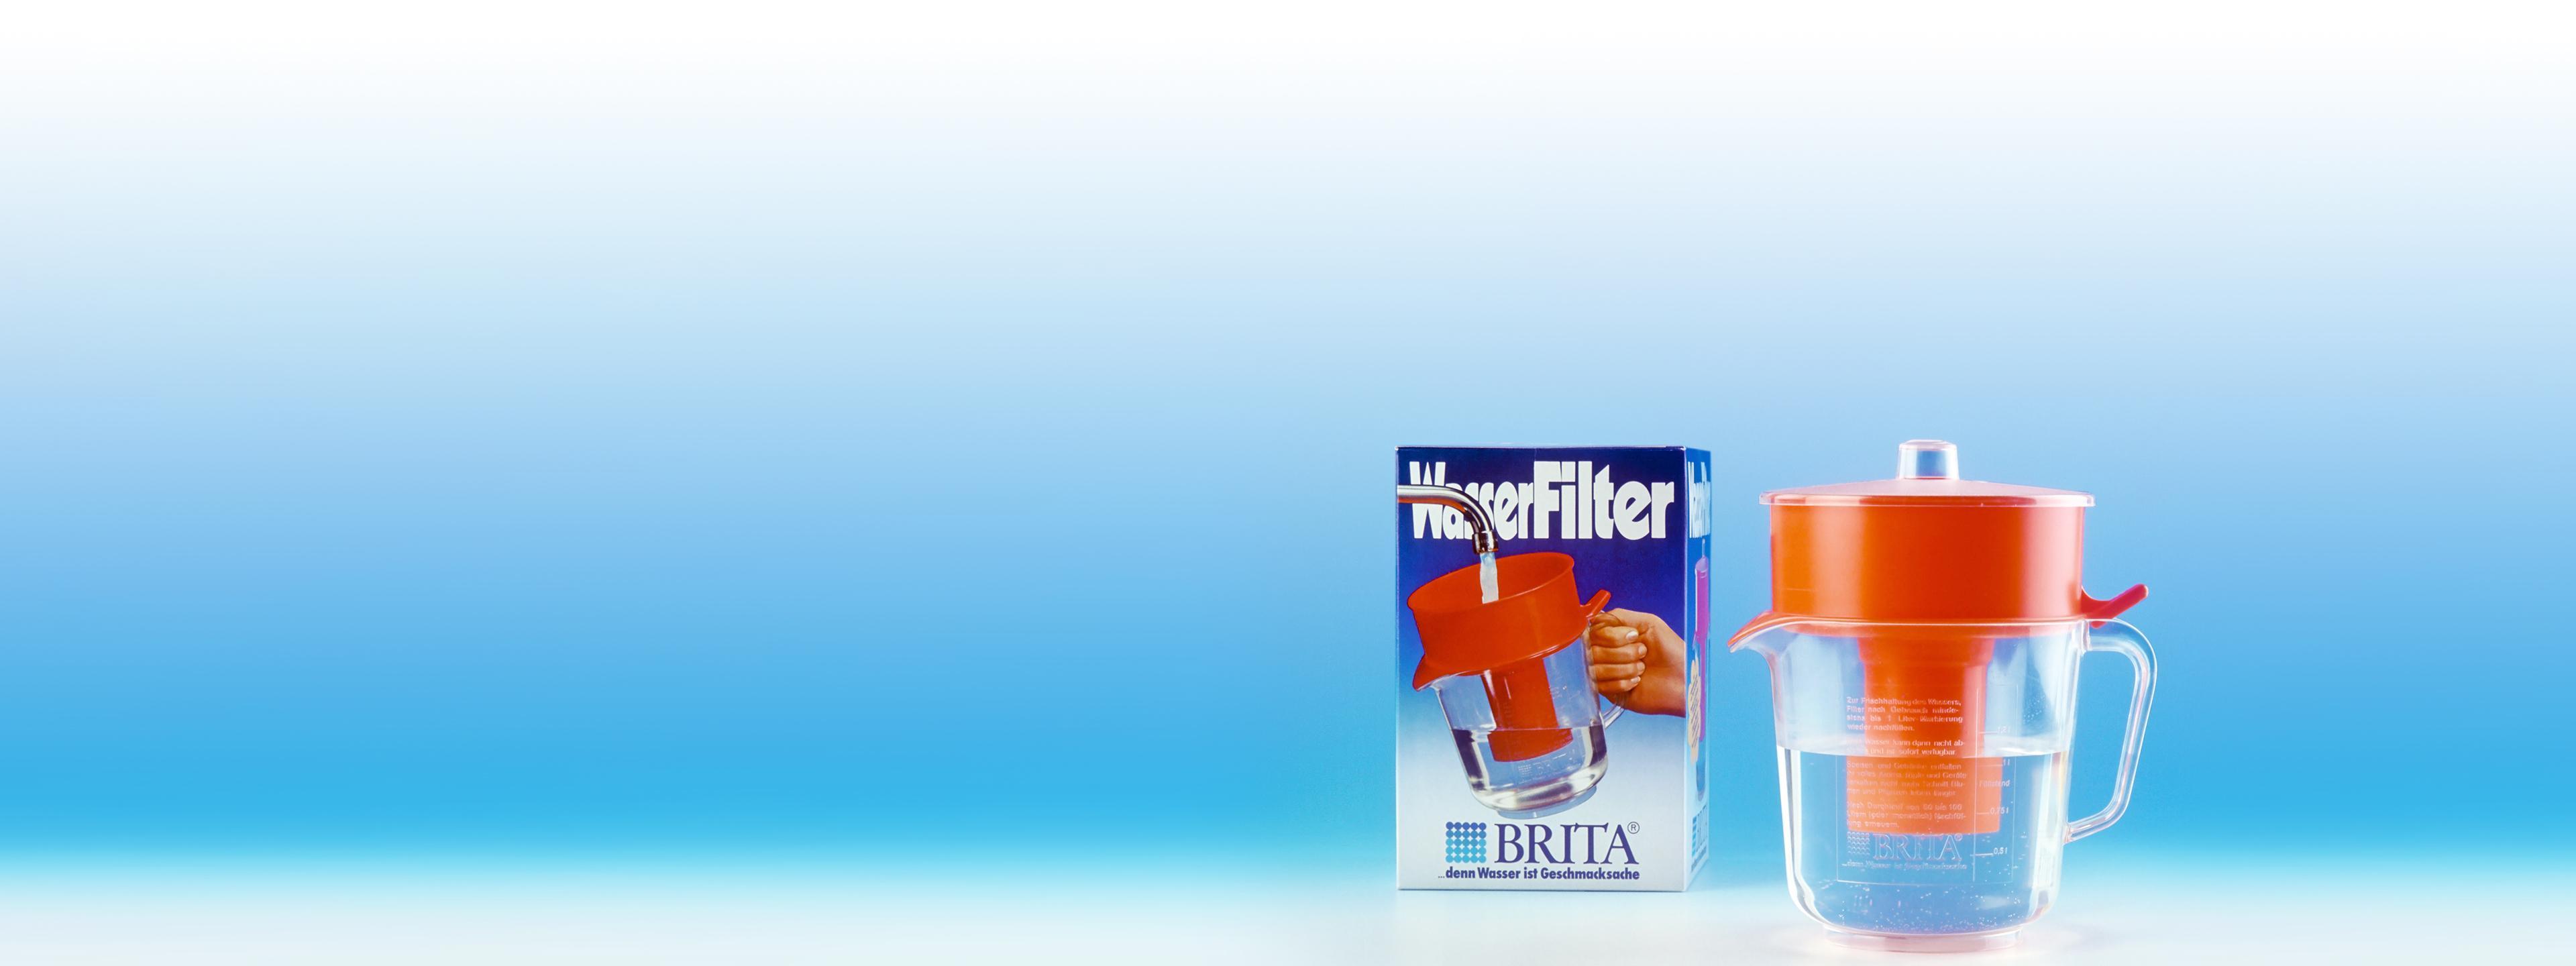 BRITA history first water filter